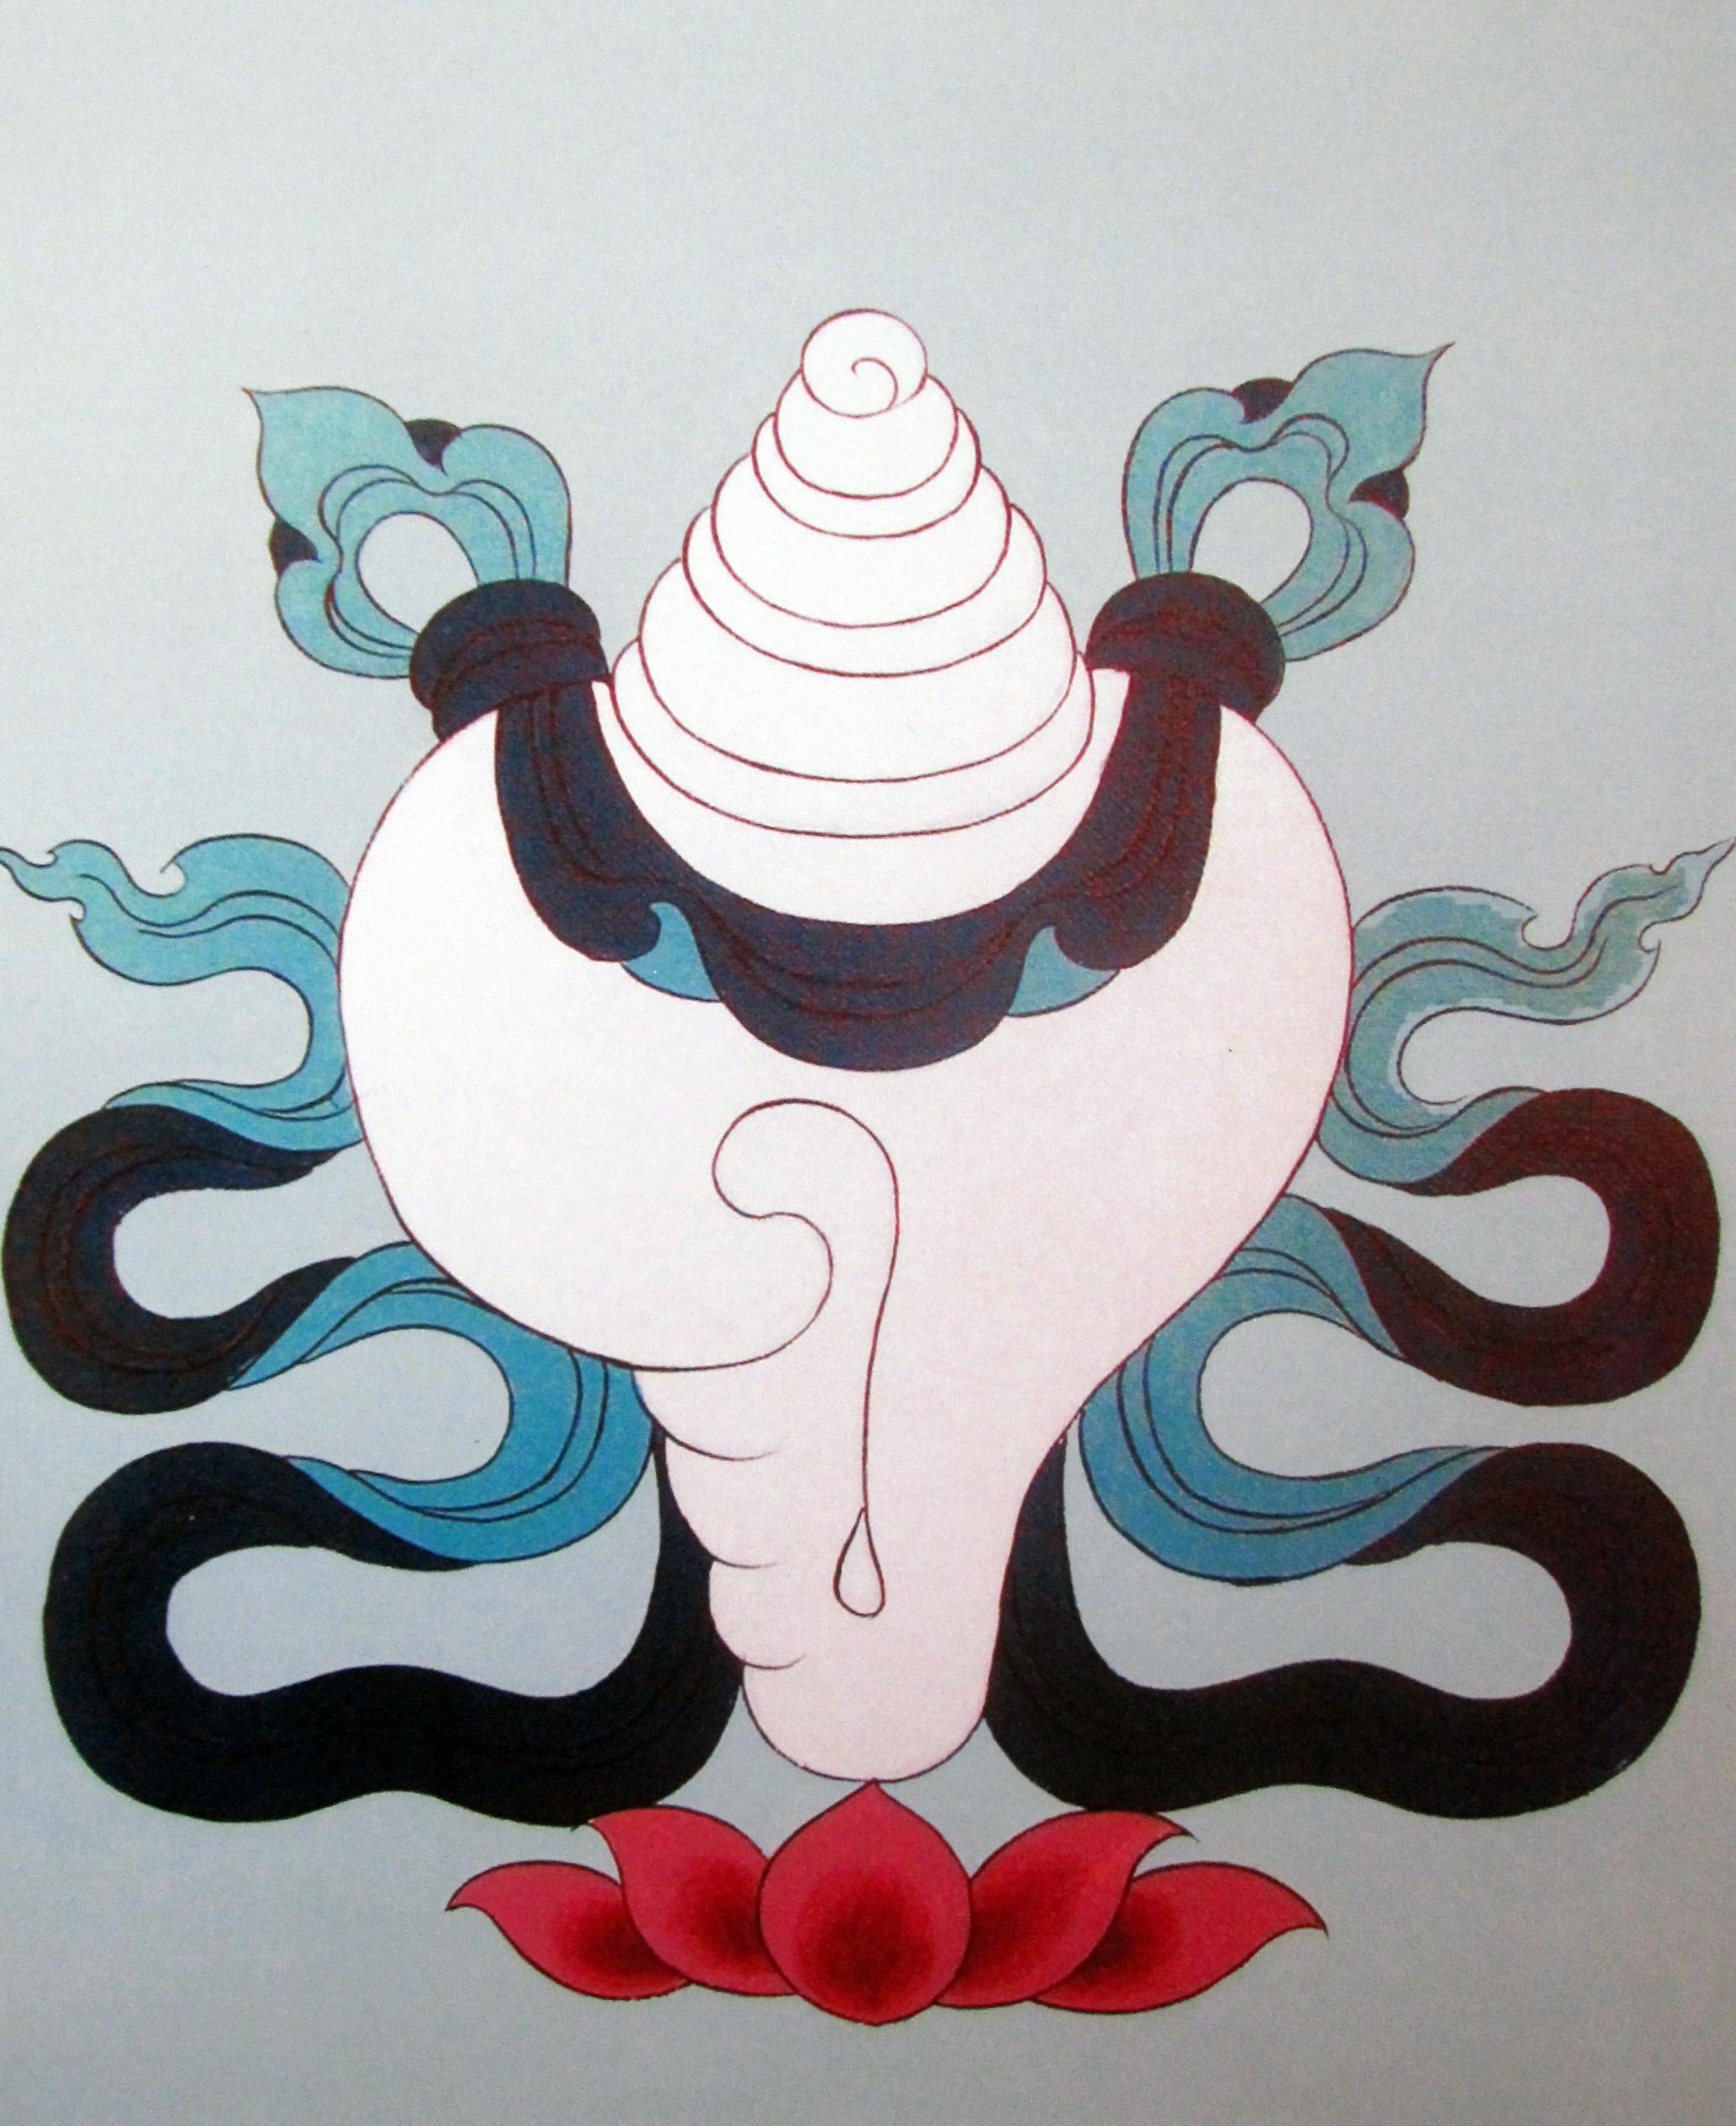 Yungdrung Bon Sacred Symbols